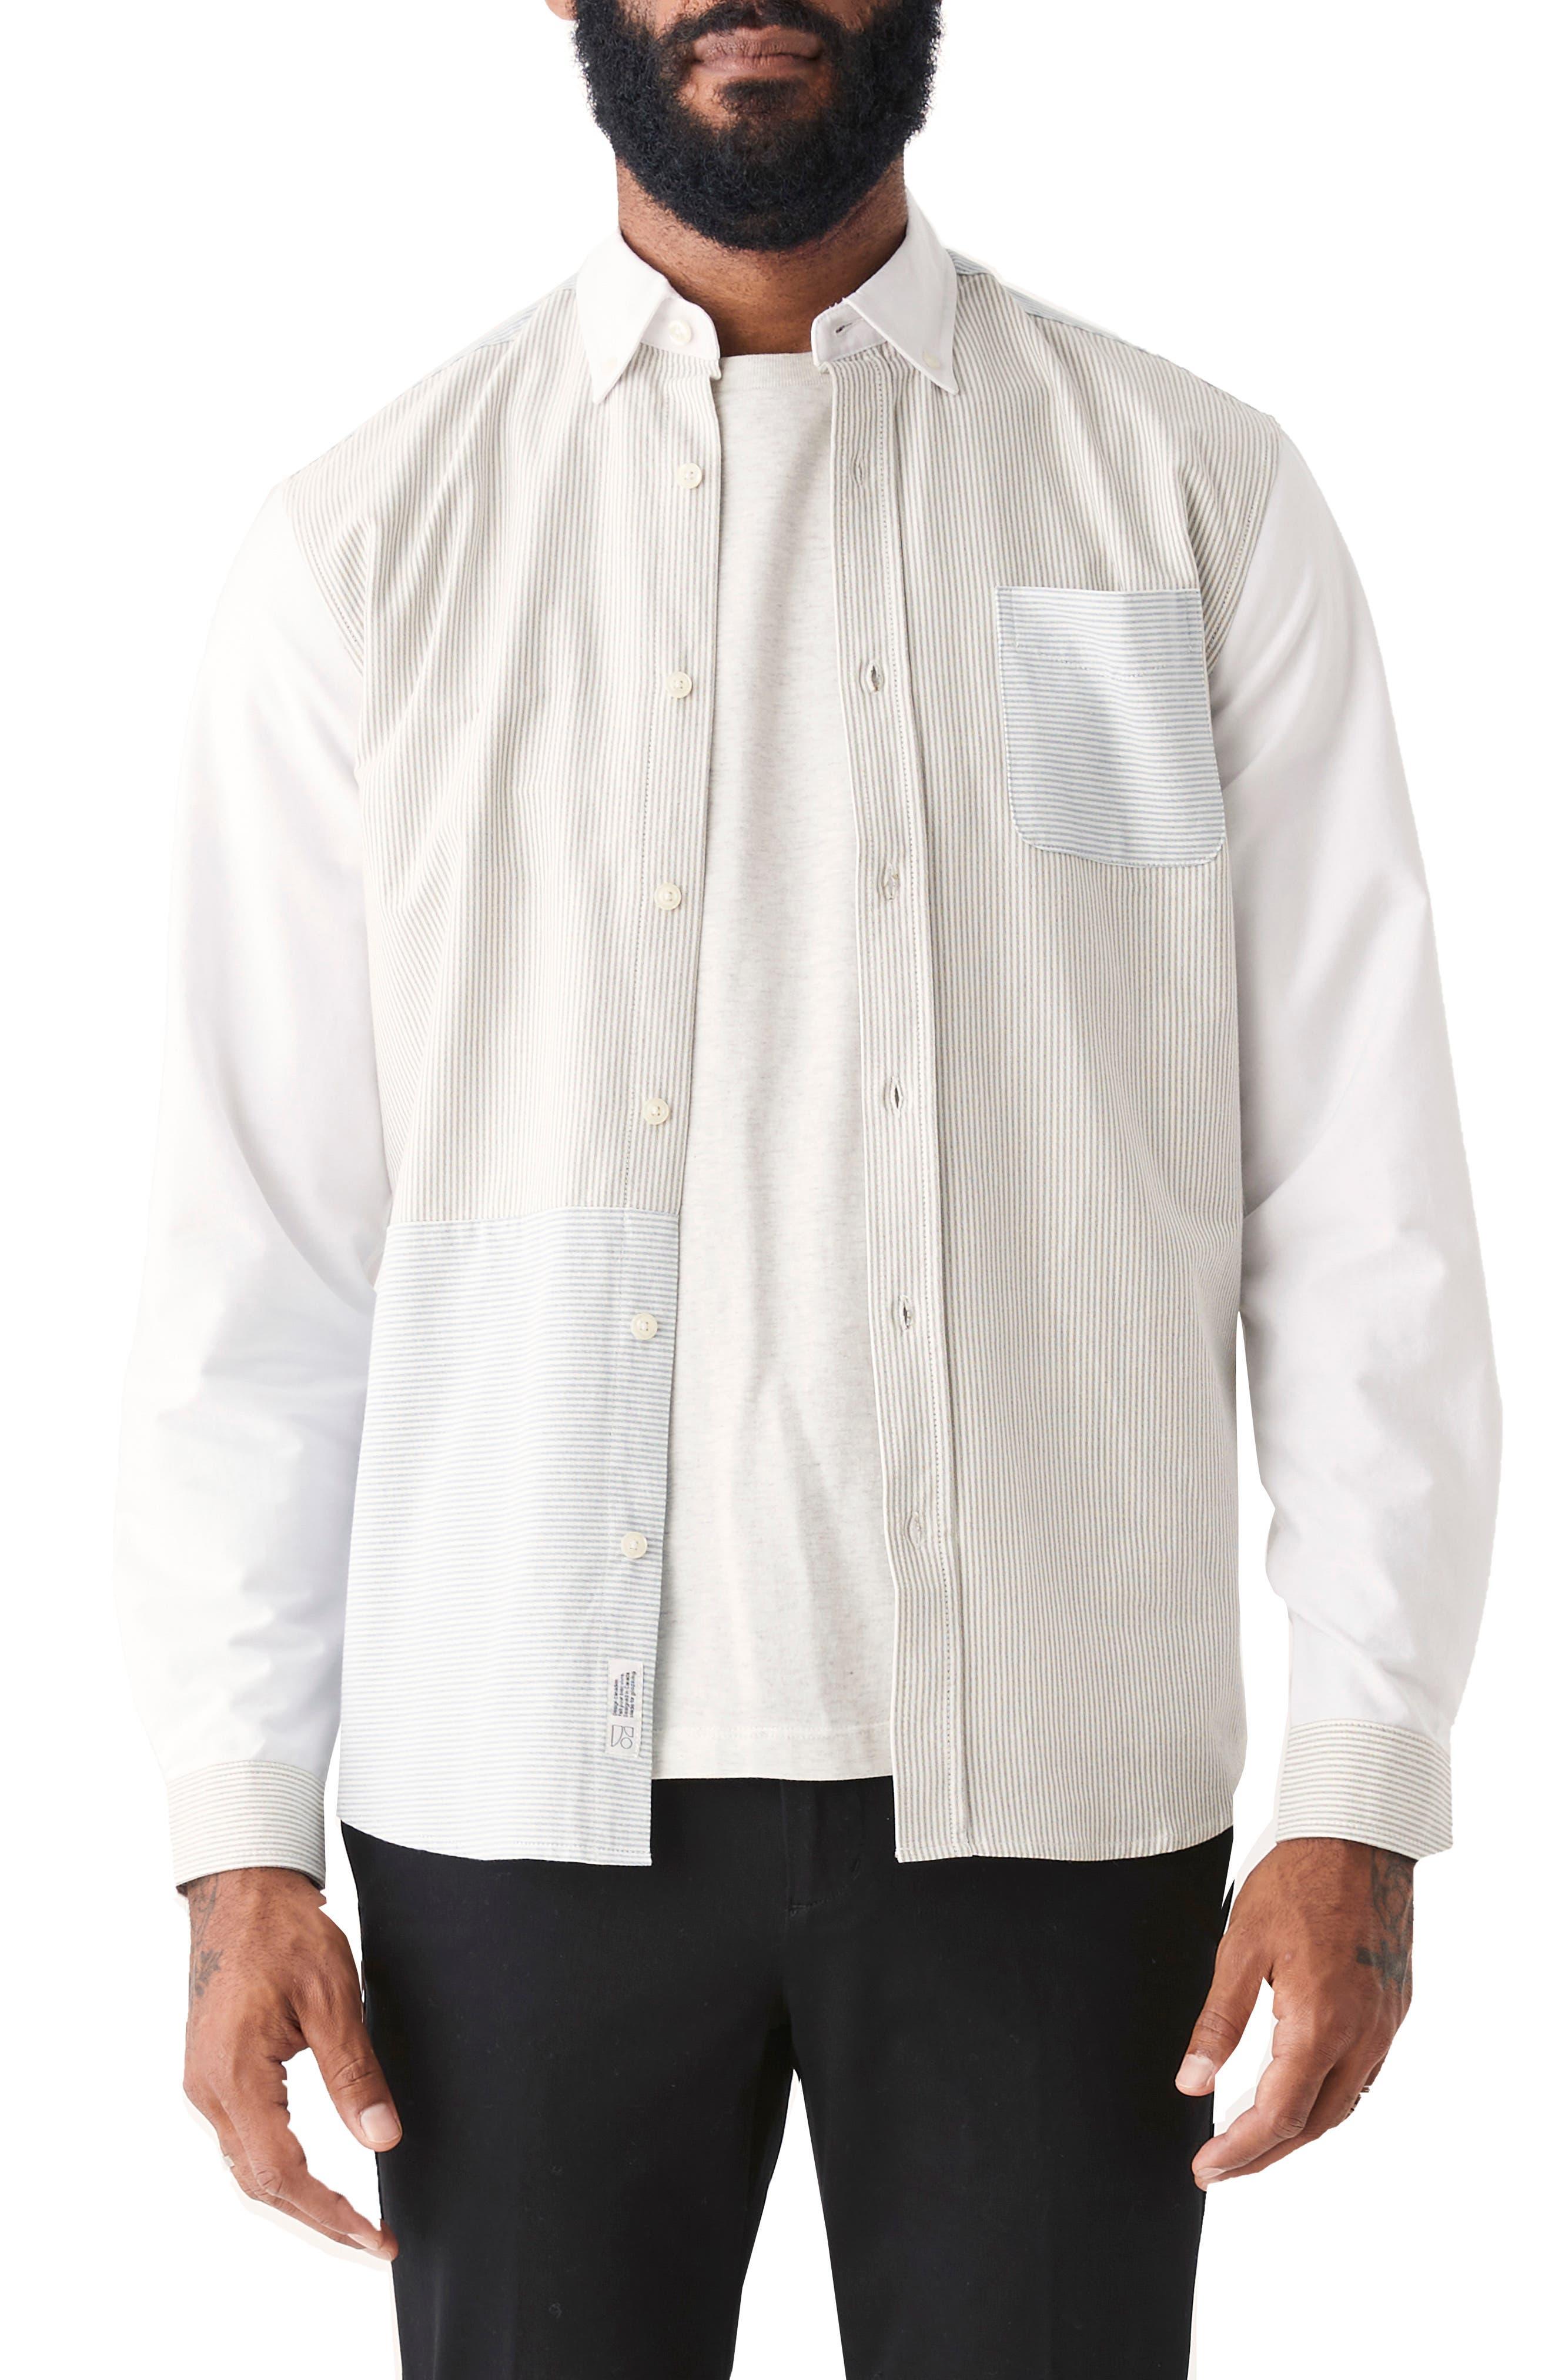 Jasper Patchwork Stripe Organic Cotton Oxford Button-Up Shirt